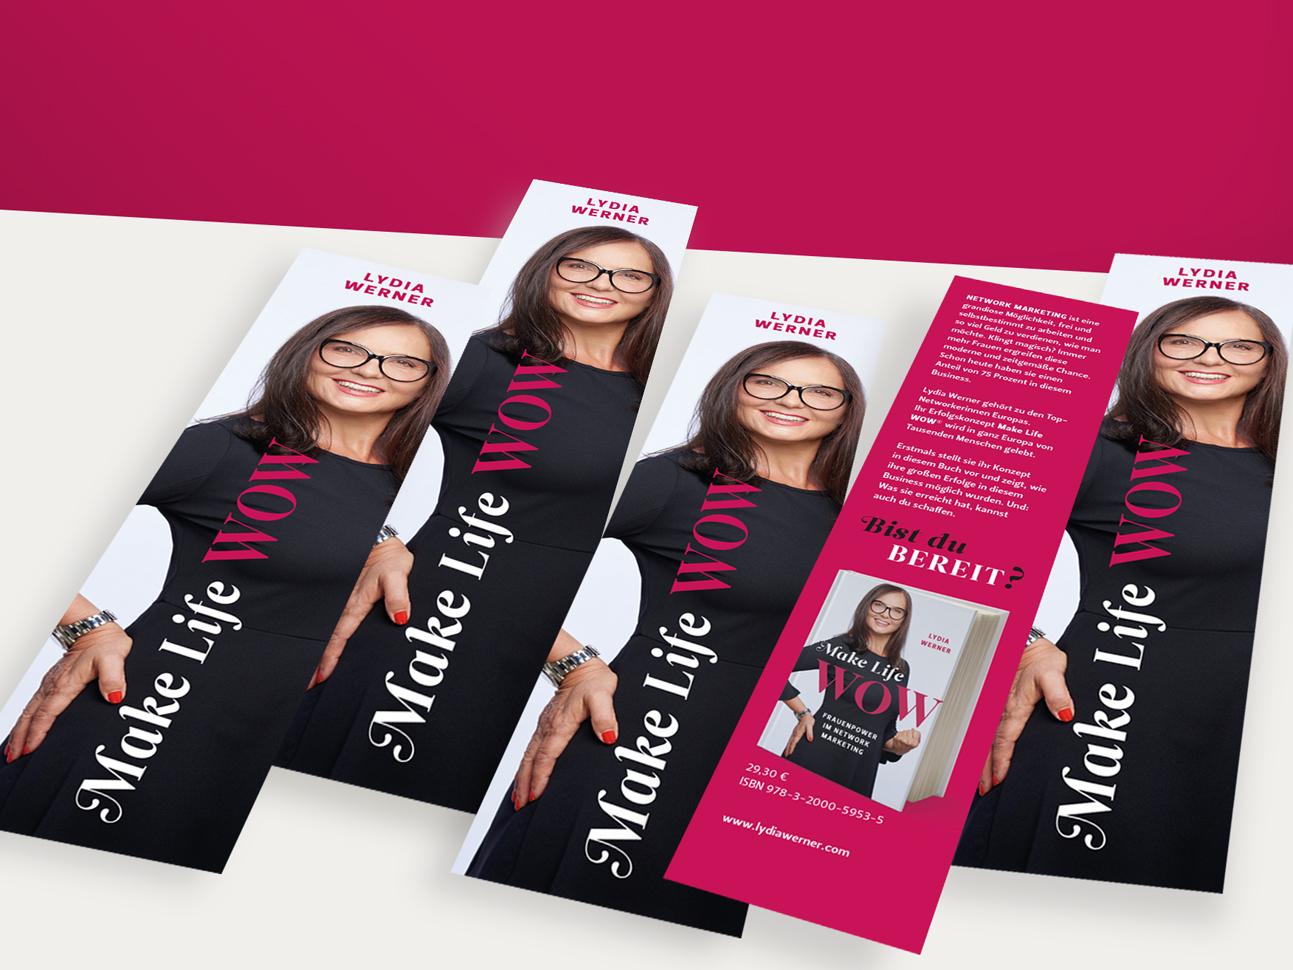 martin zech design, lesezeichen, self publishing, lydia werner, make life wow